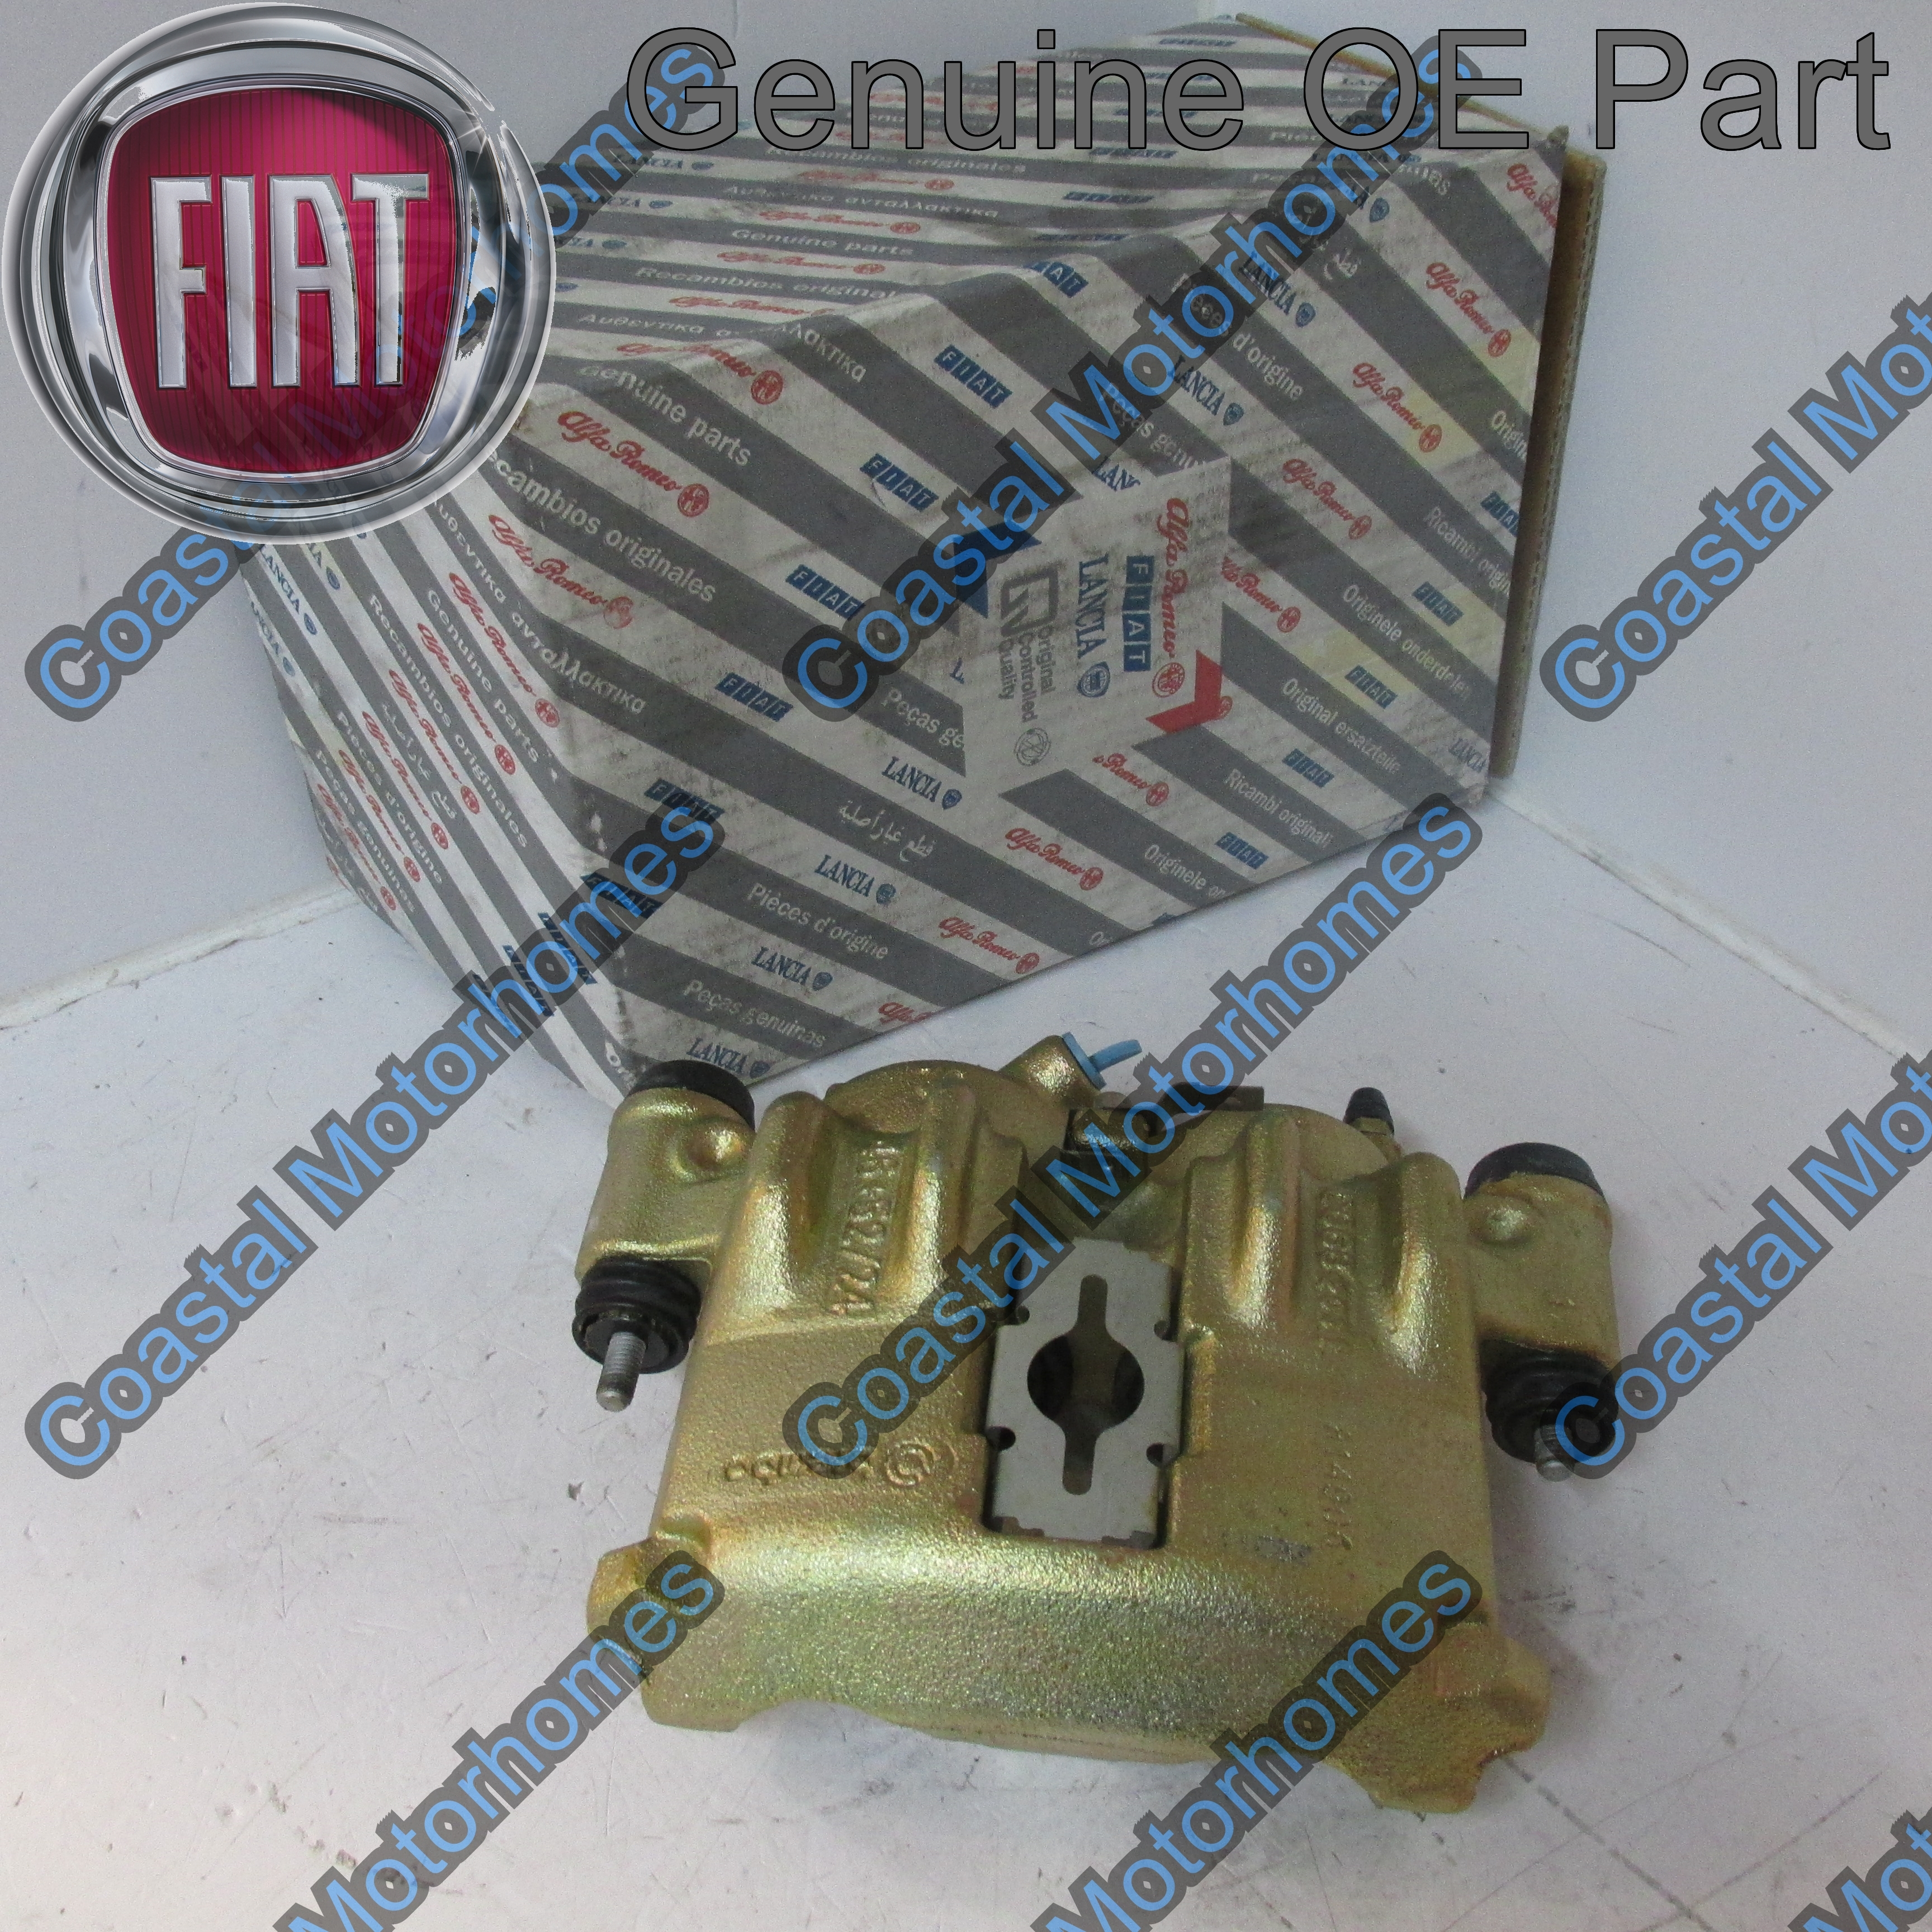 Front Right Brake Caliper for Citroen Relay Peugeot Boxer Fiat Ducato